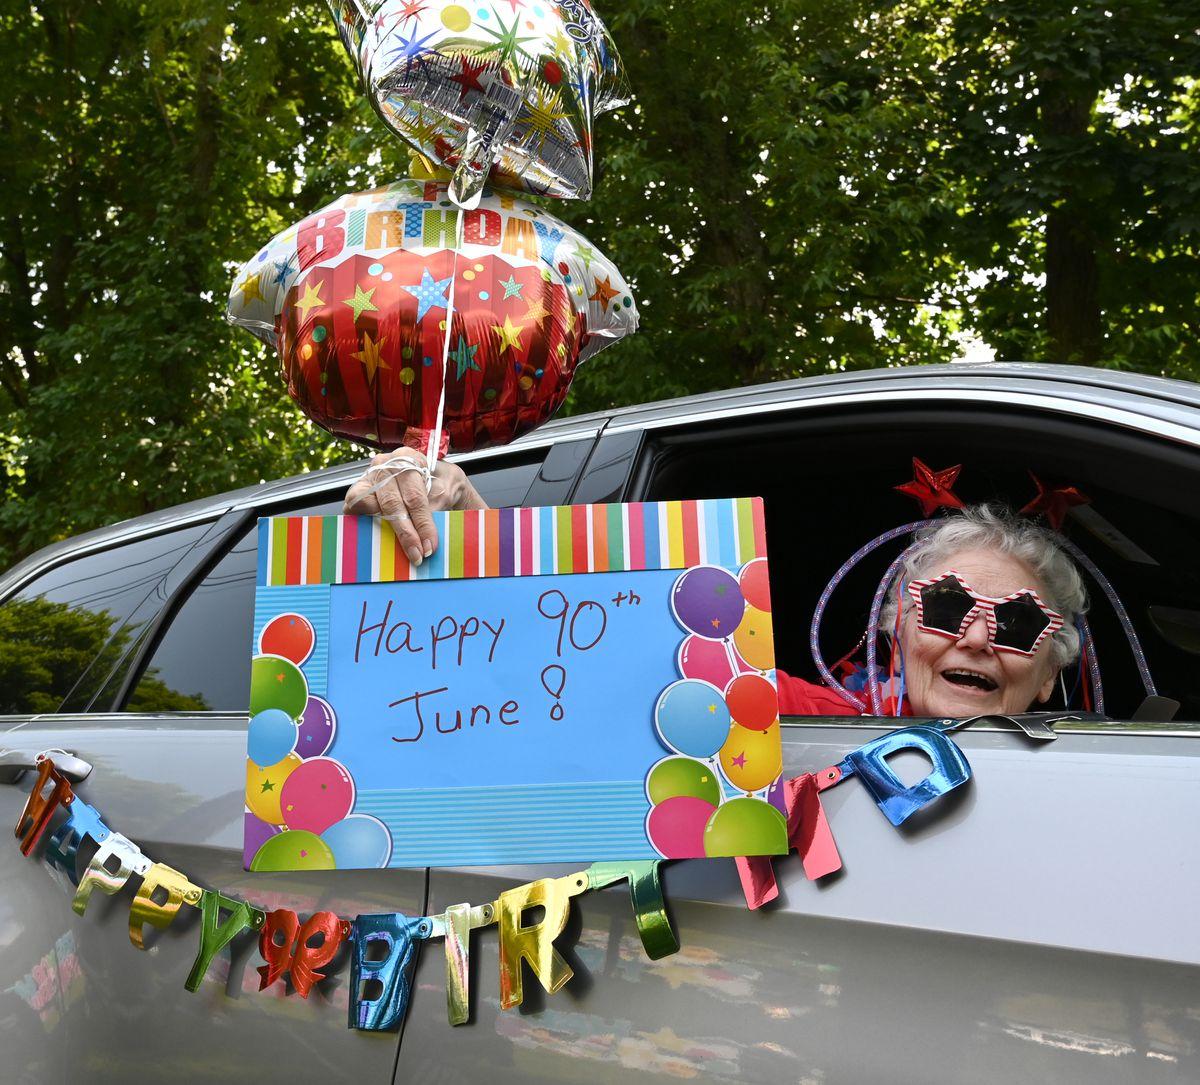 North Harford community celebrates longtime teacher's 90th birthday | PHOTOS